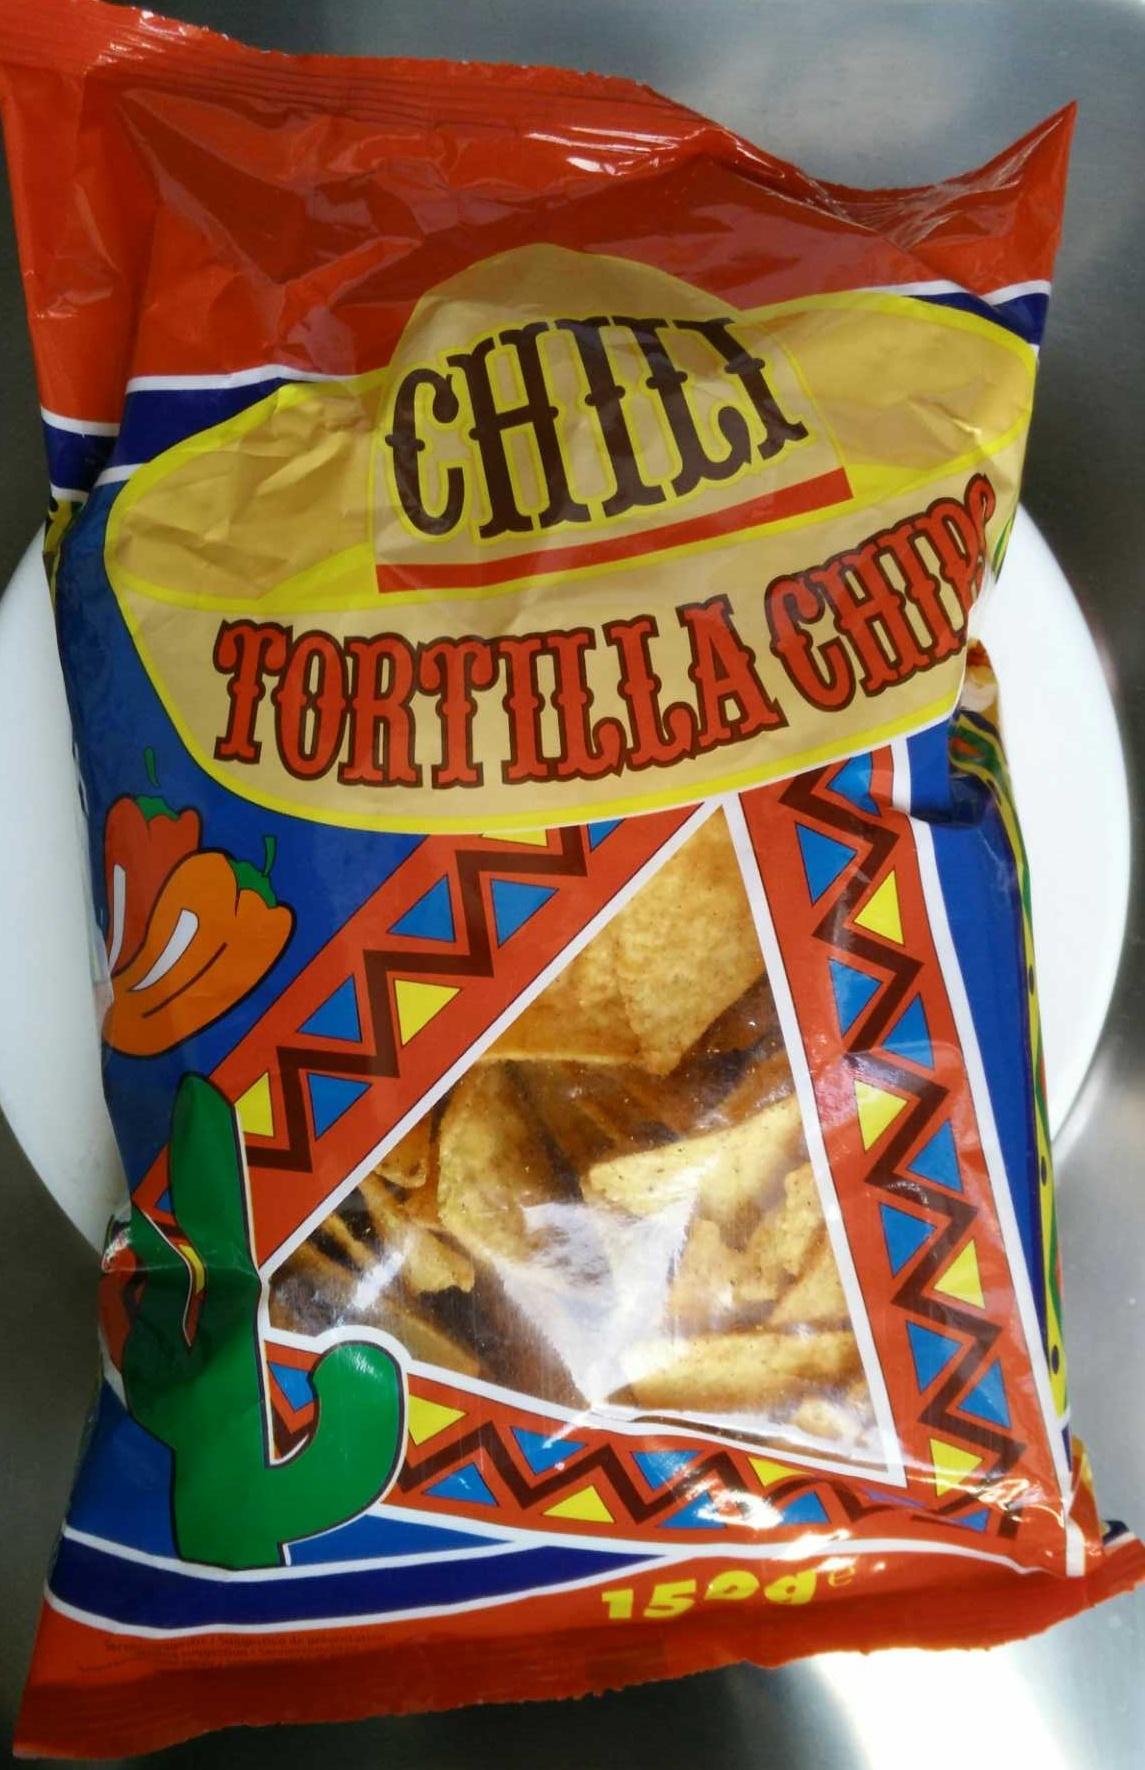 Chili Tortilla Chips - Produit